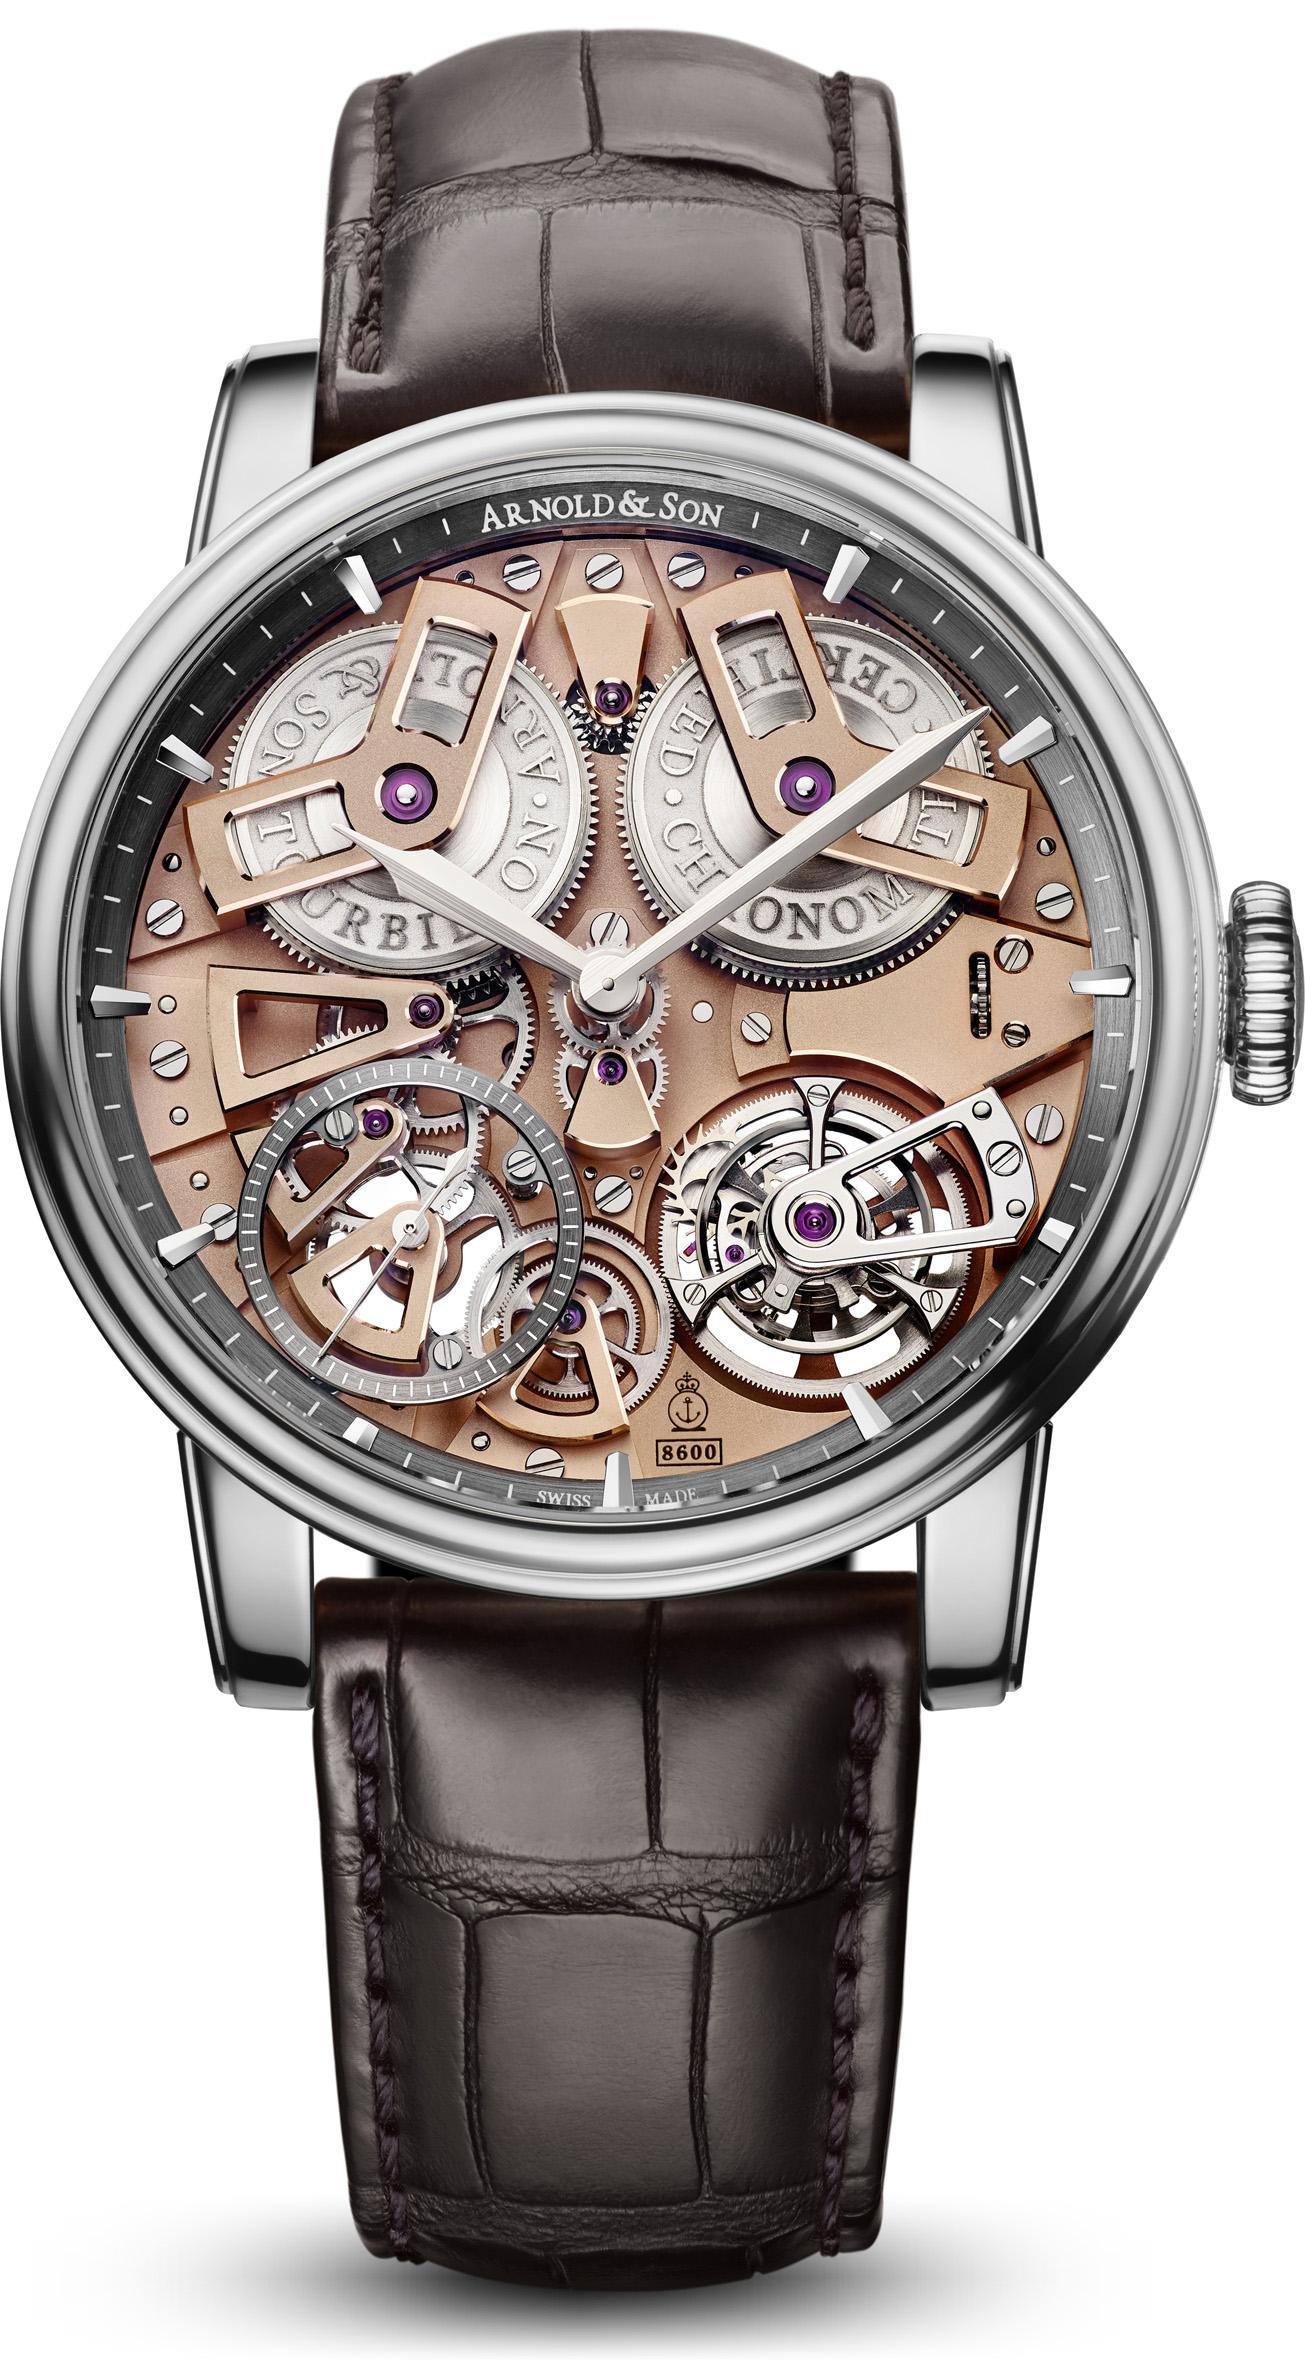 ArnoldSon_Tourbillon Chronometer No36_ST_soldat_kl